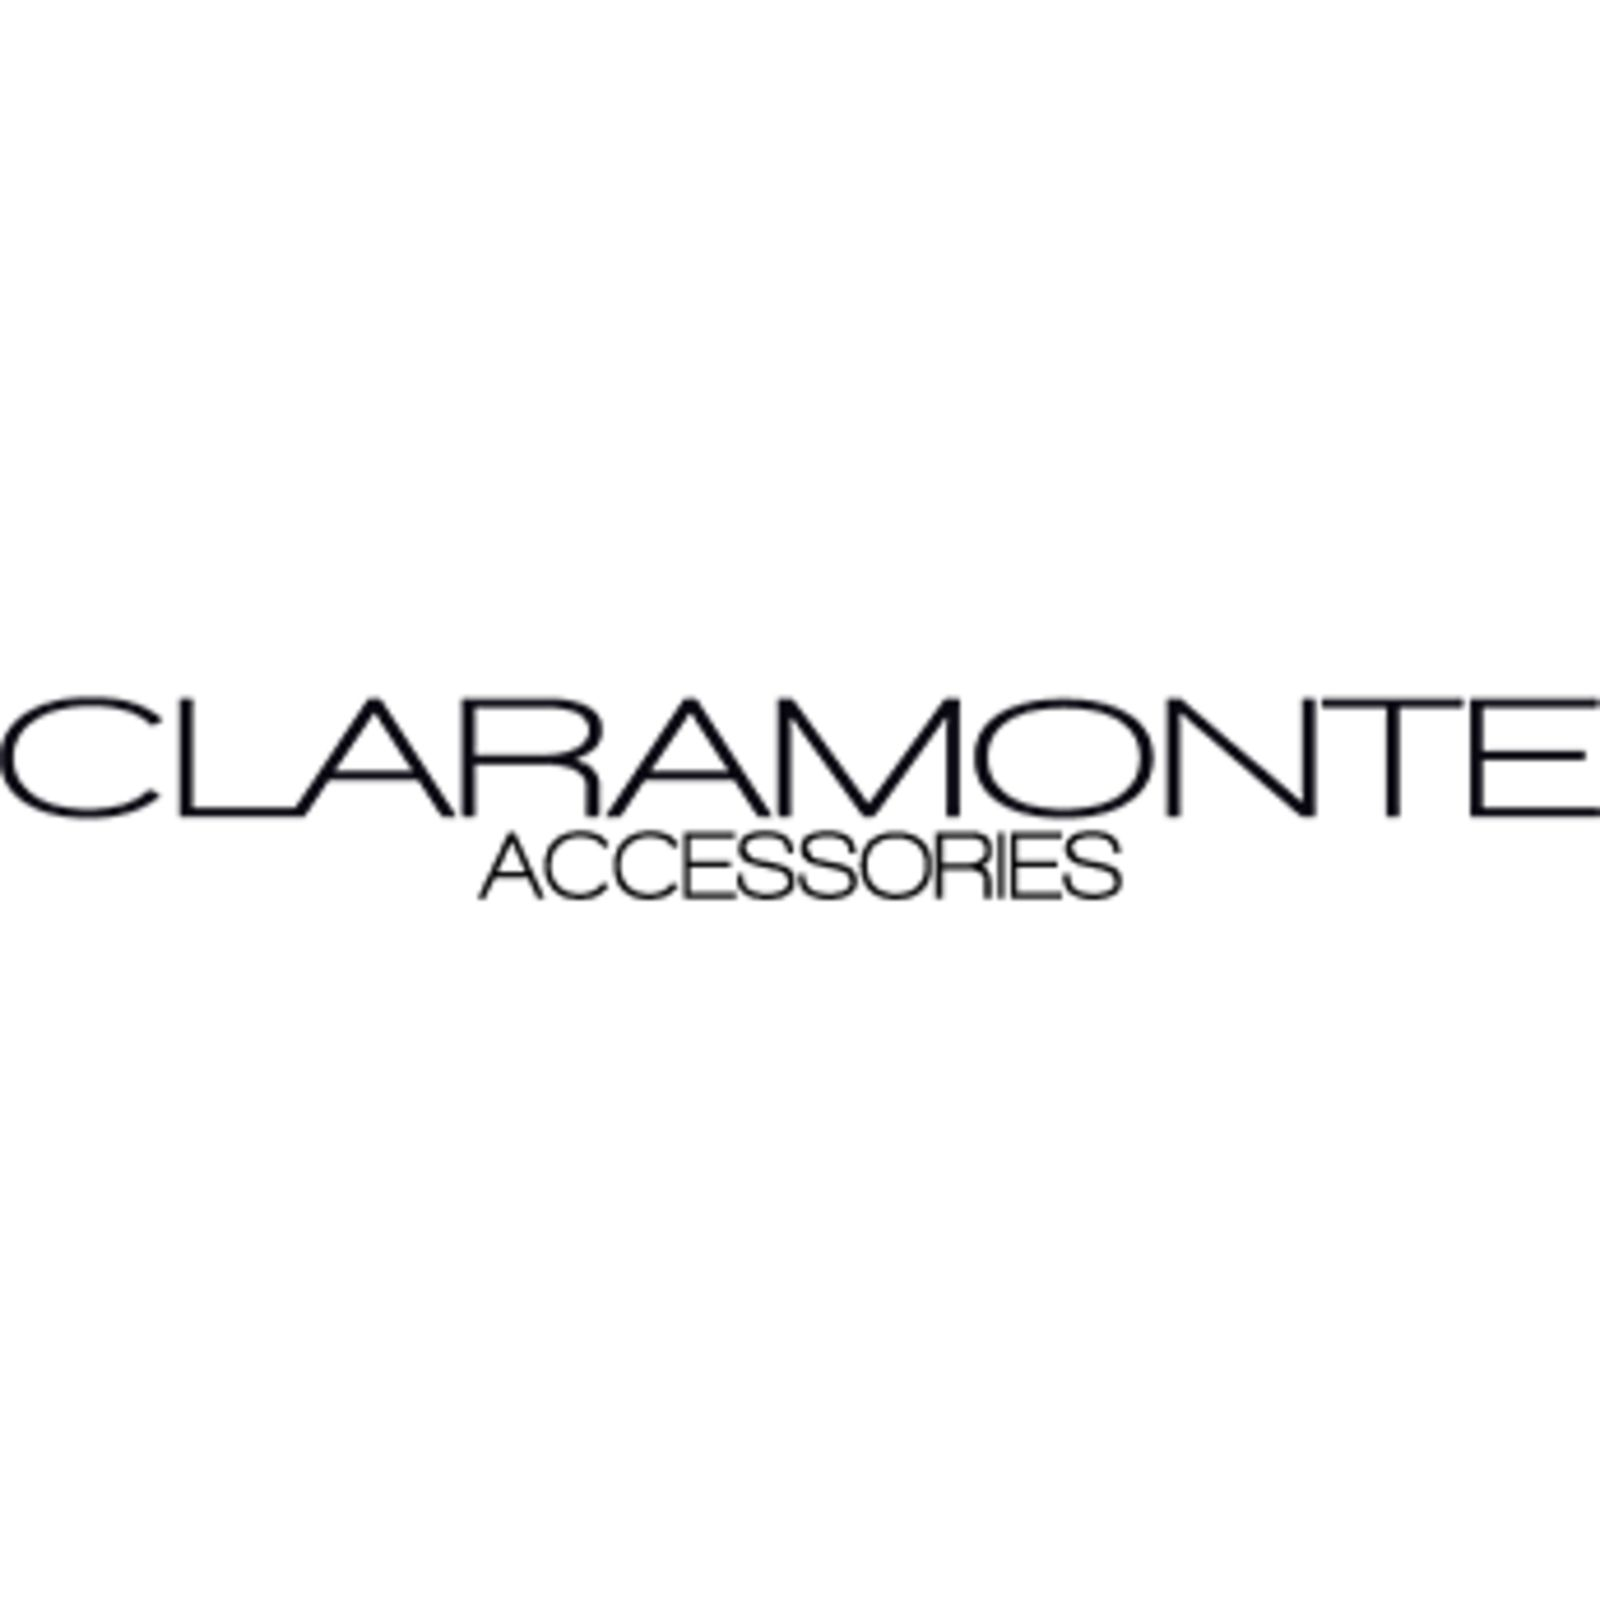 CLARAMONTE